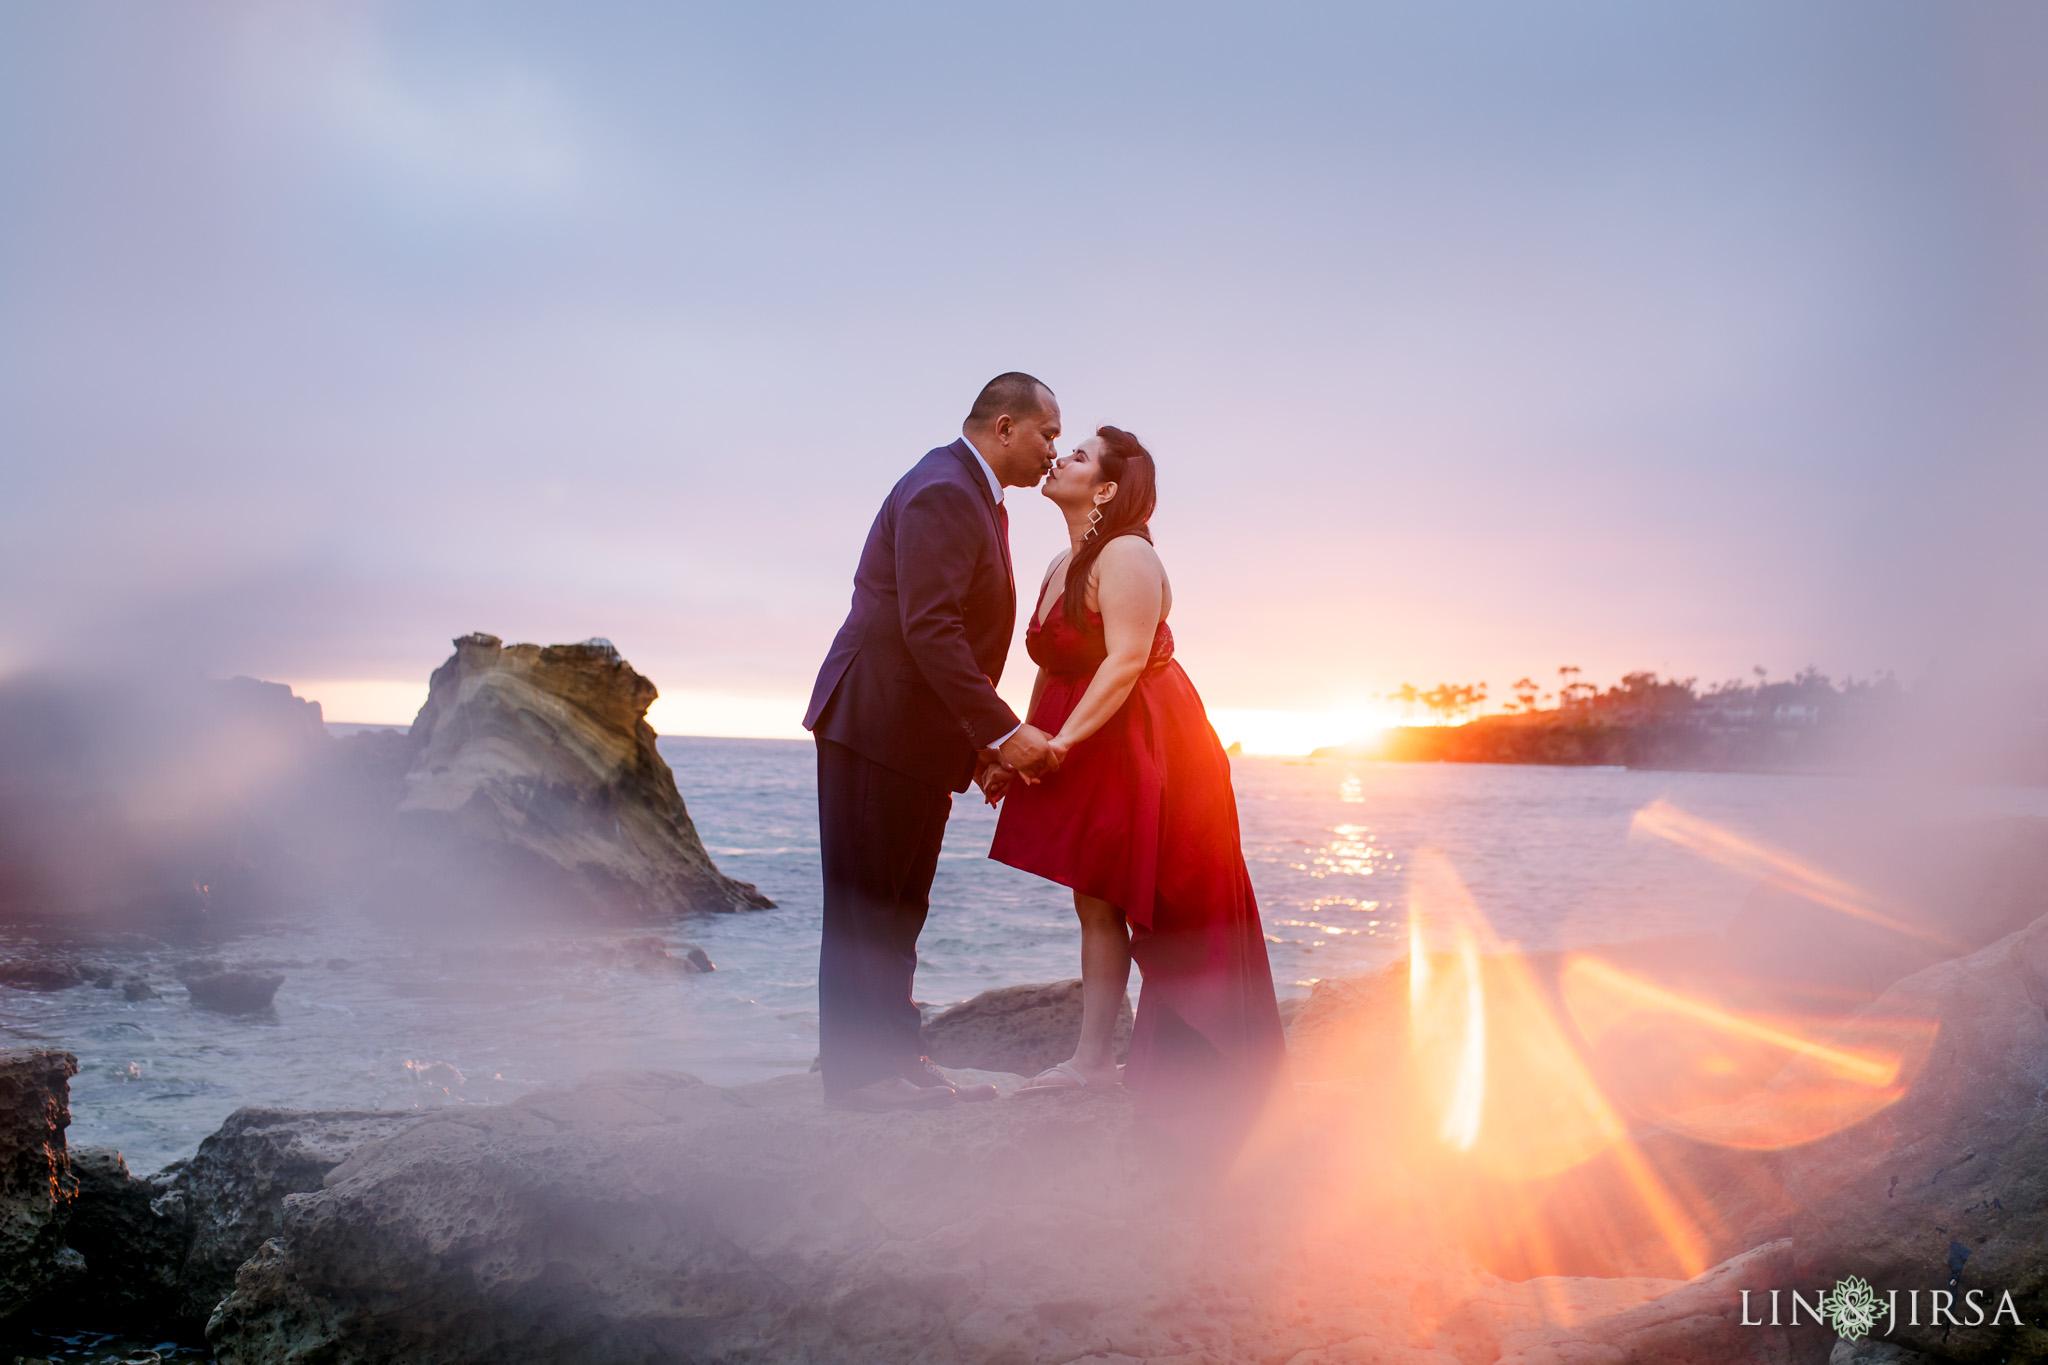 07 Heisler Park Orange County Engagement Photographer